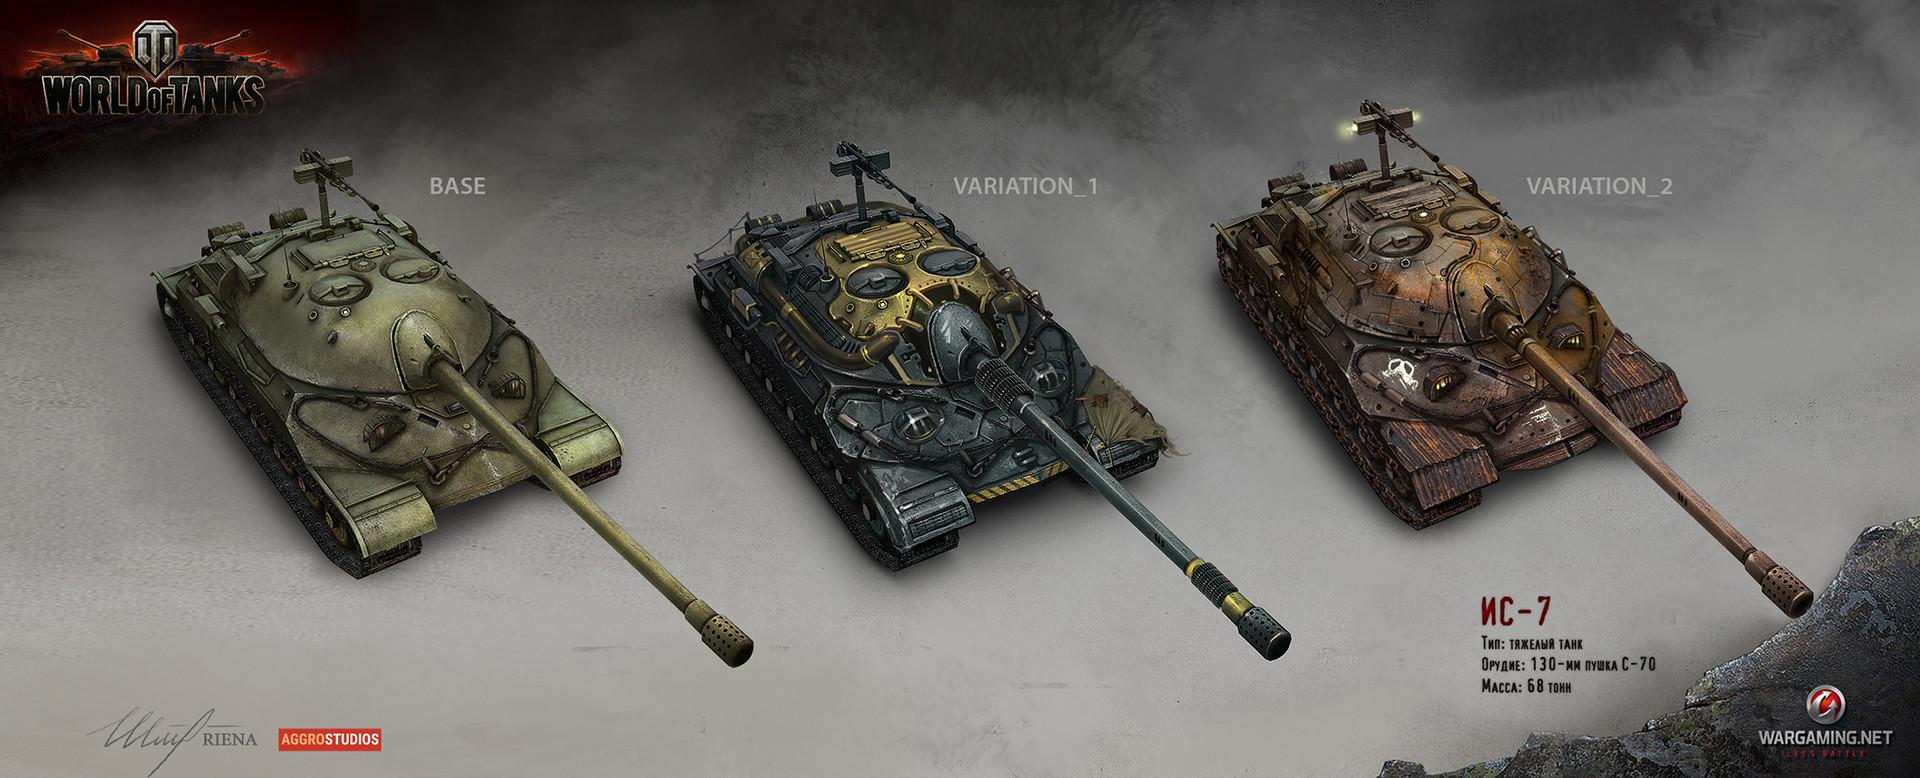 Rimma Shmeleva - Tank skins (WOT)